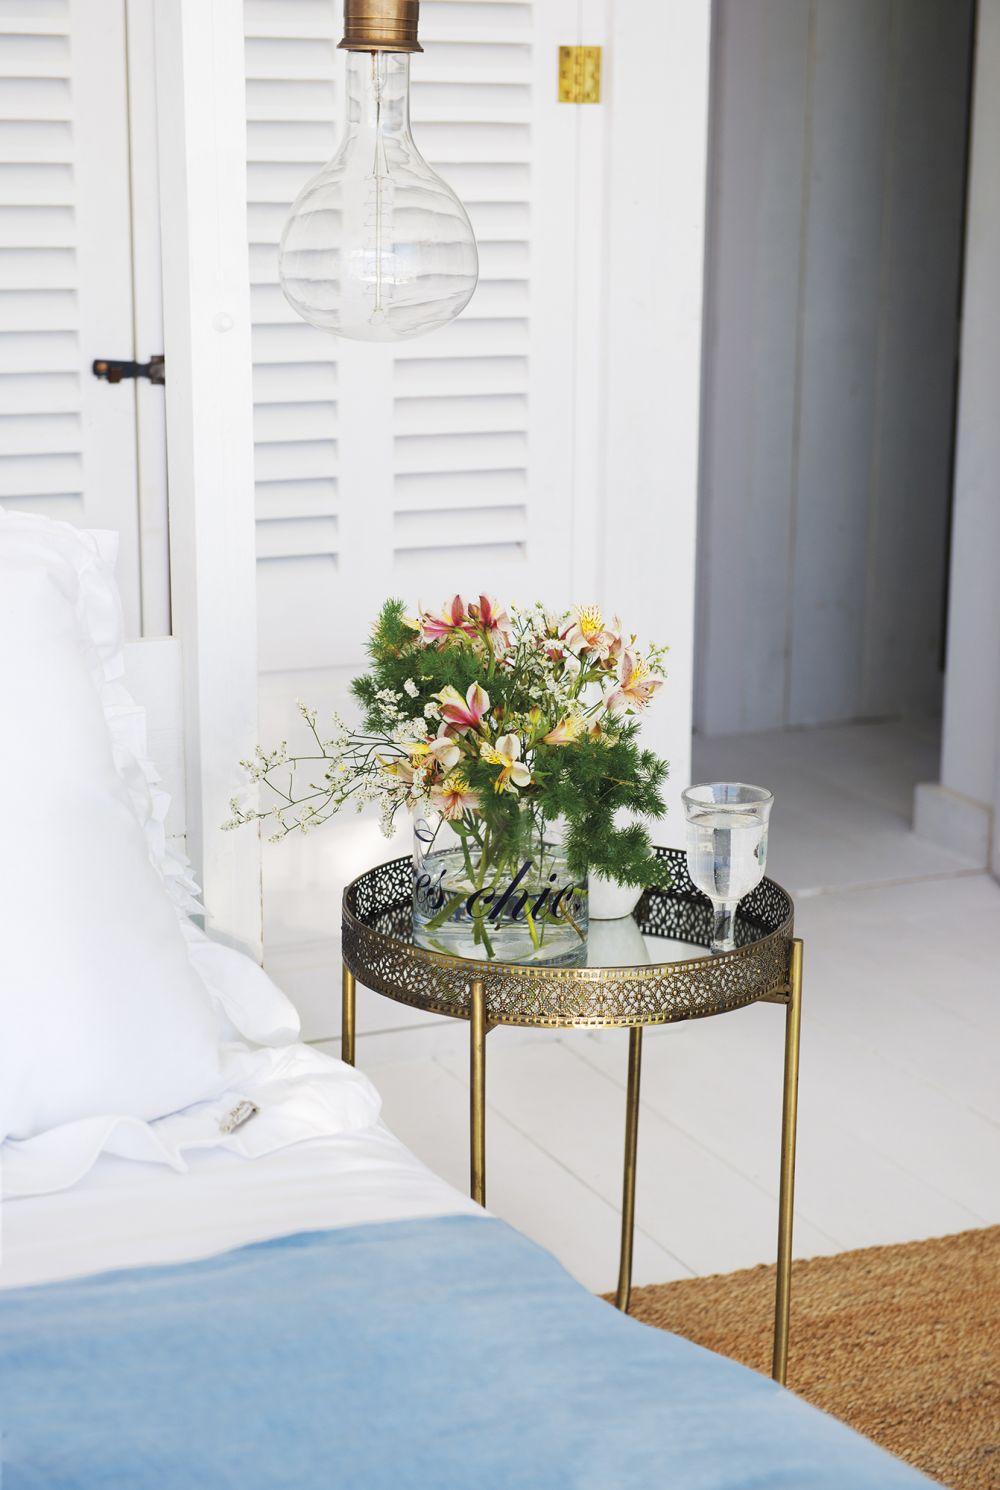 adelaparvu.com despre casa pescareasca modernizata in Mallorca, designer Catalina Socias, Foto ElMueble Stella Rotger (16)